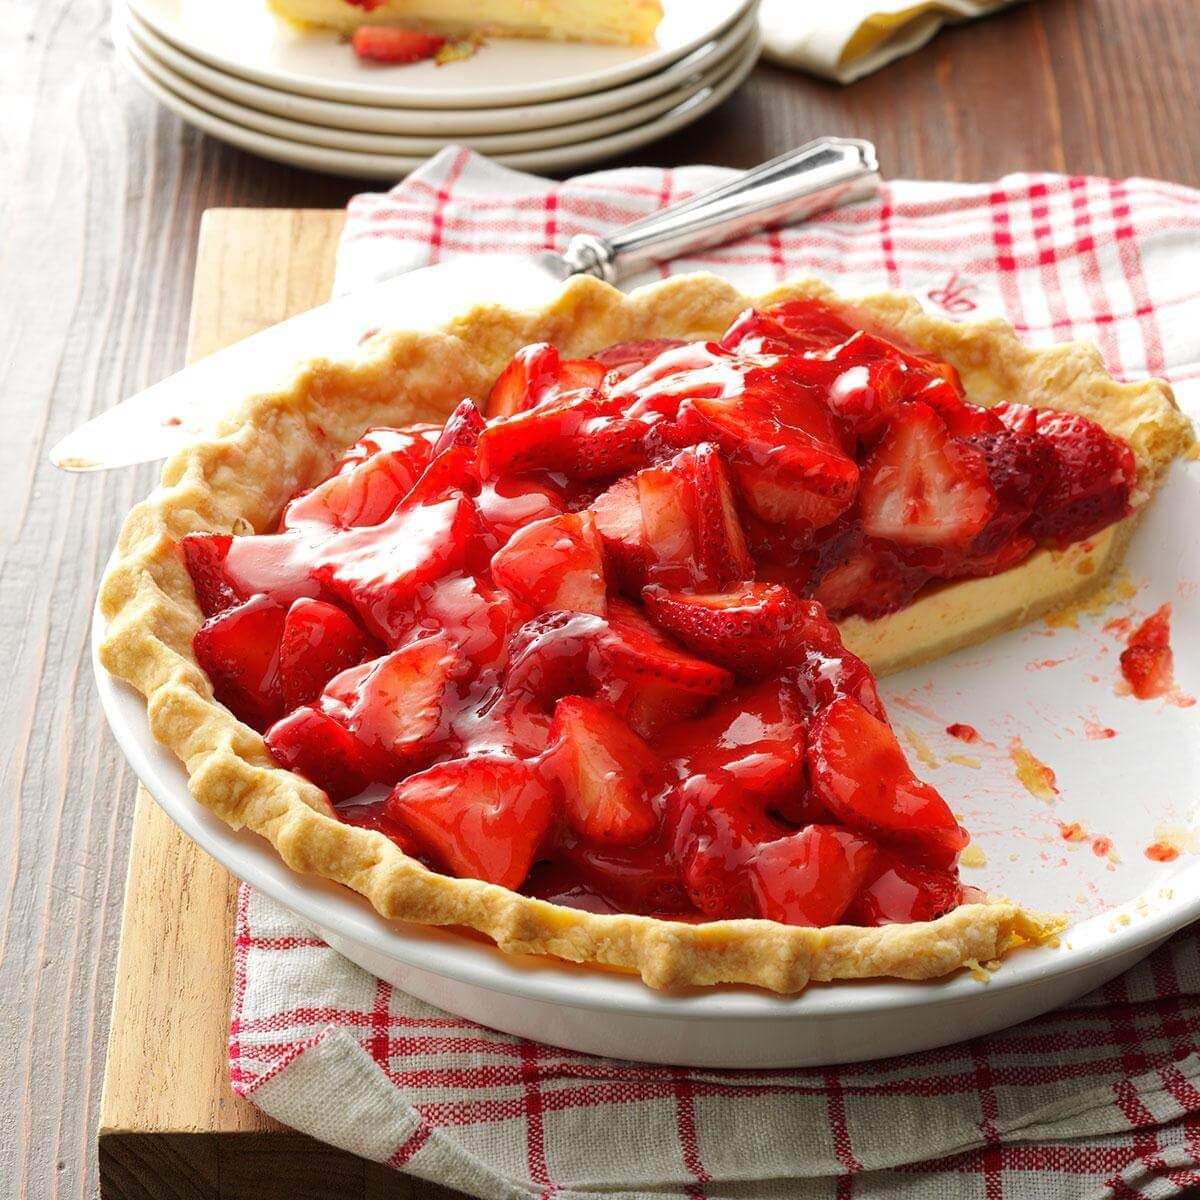 Strawberry Pie Taste Of Home Yummy Bites 123 Flavor Strawbearry